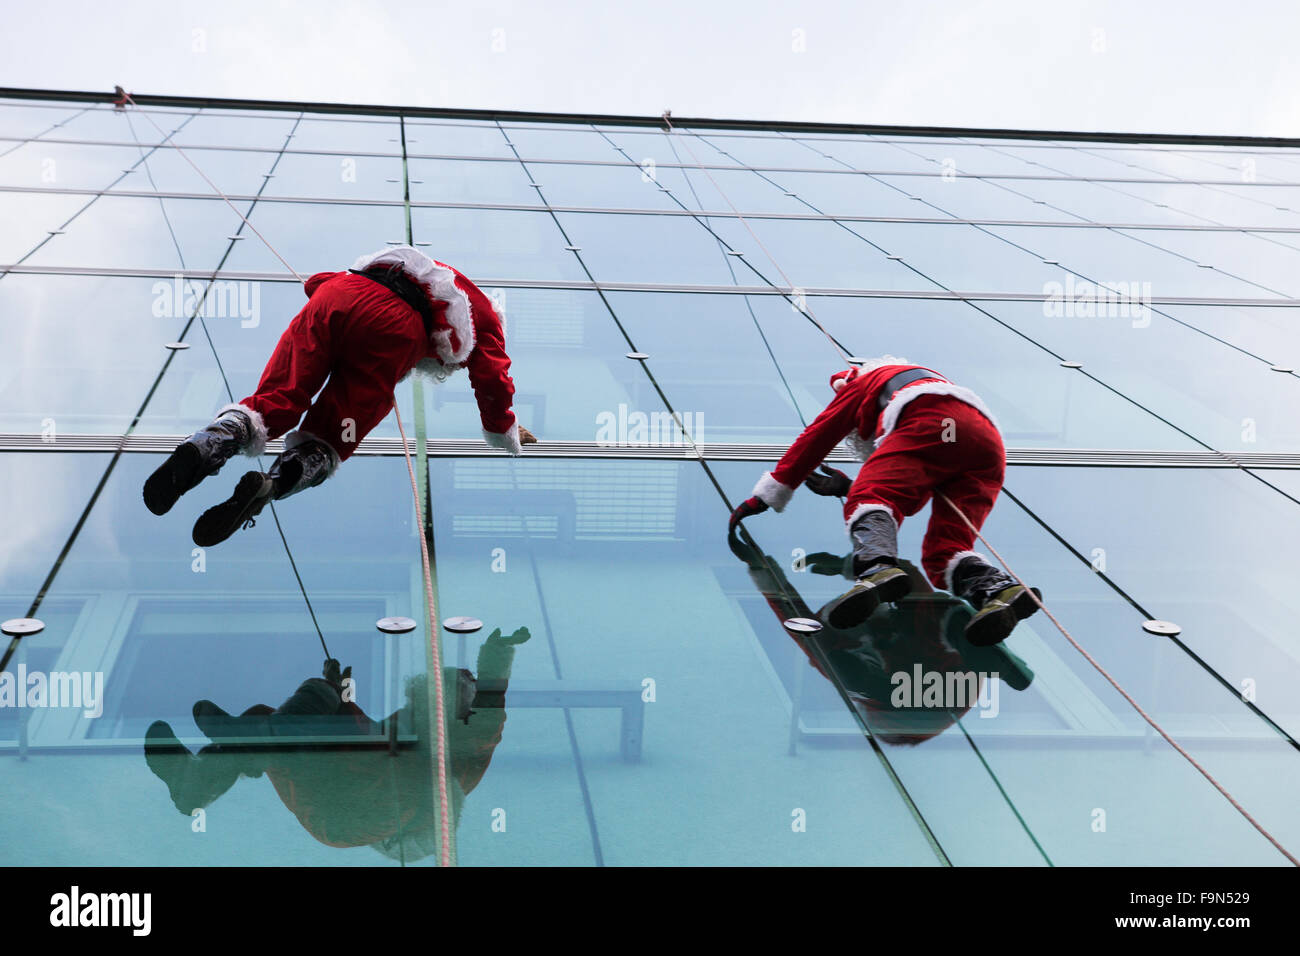 Ljubljana, Slowenien. 15. Dezember 2015. Santa Claus Abstieg vom Dach der Kinderklinik in Ljubljana, Kinder innerhalb Stockfoto